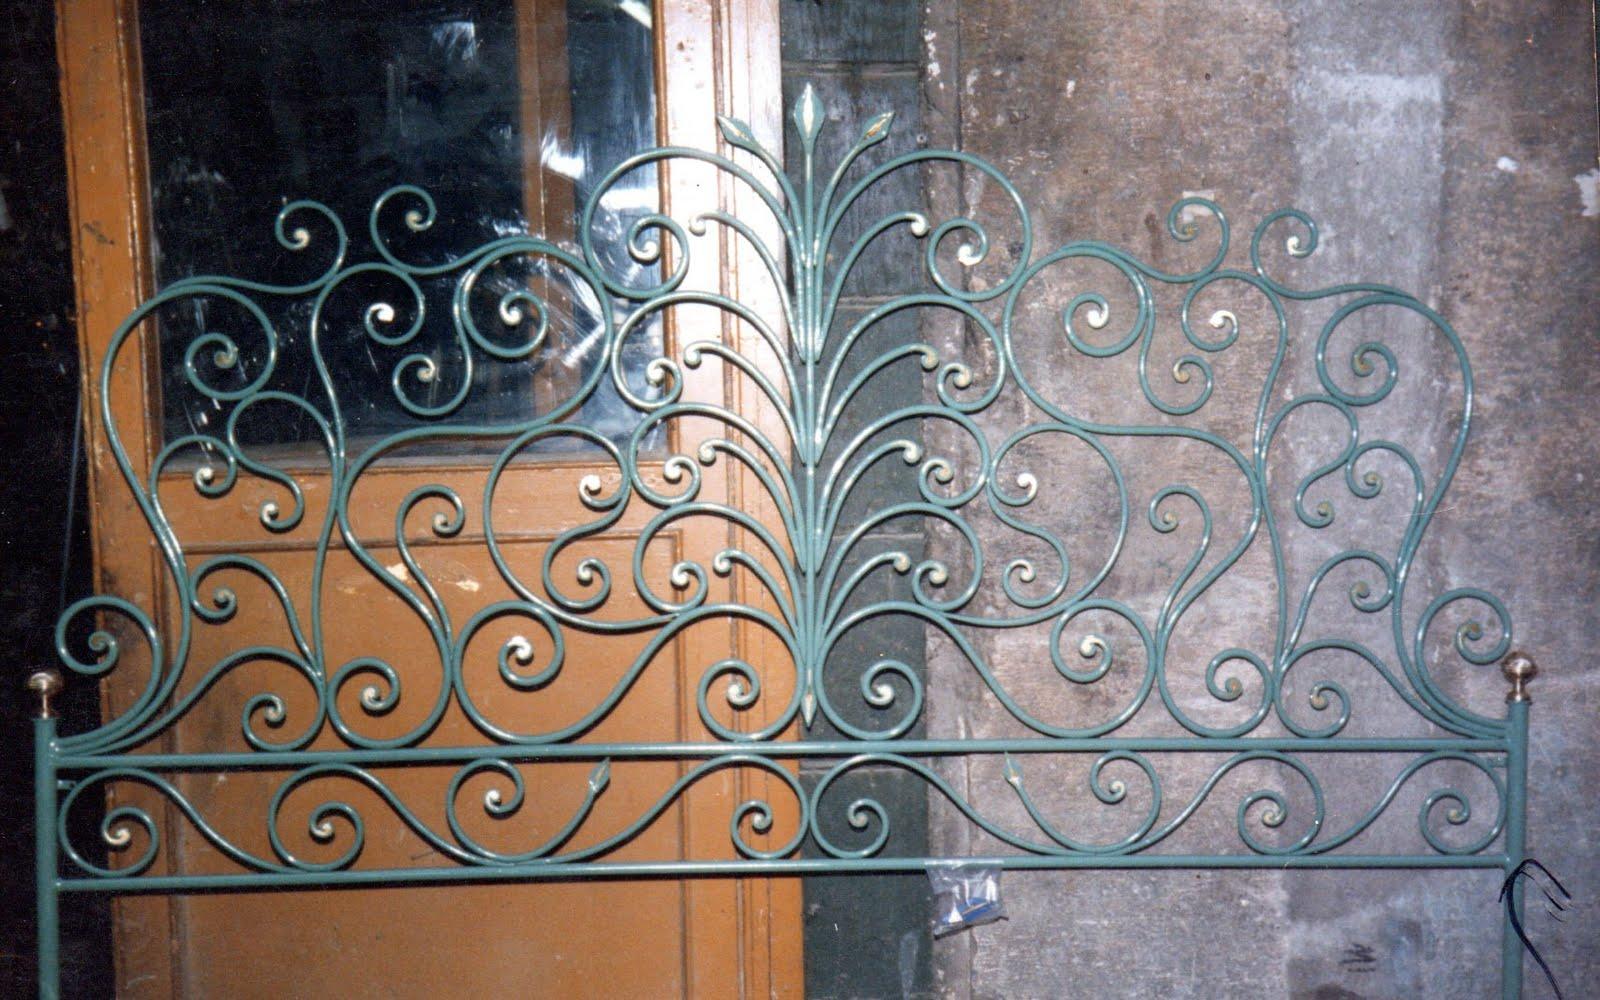 Letti In Ferro Battuto Antichi : Ditta brogani maurizio lavori in ferro battuto e restauri in